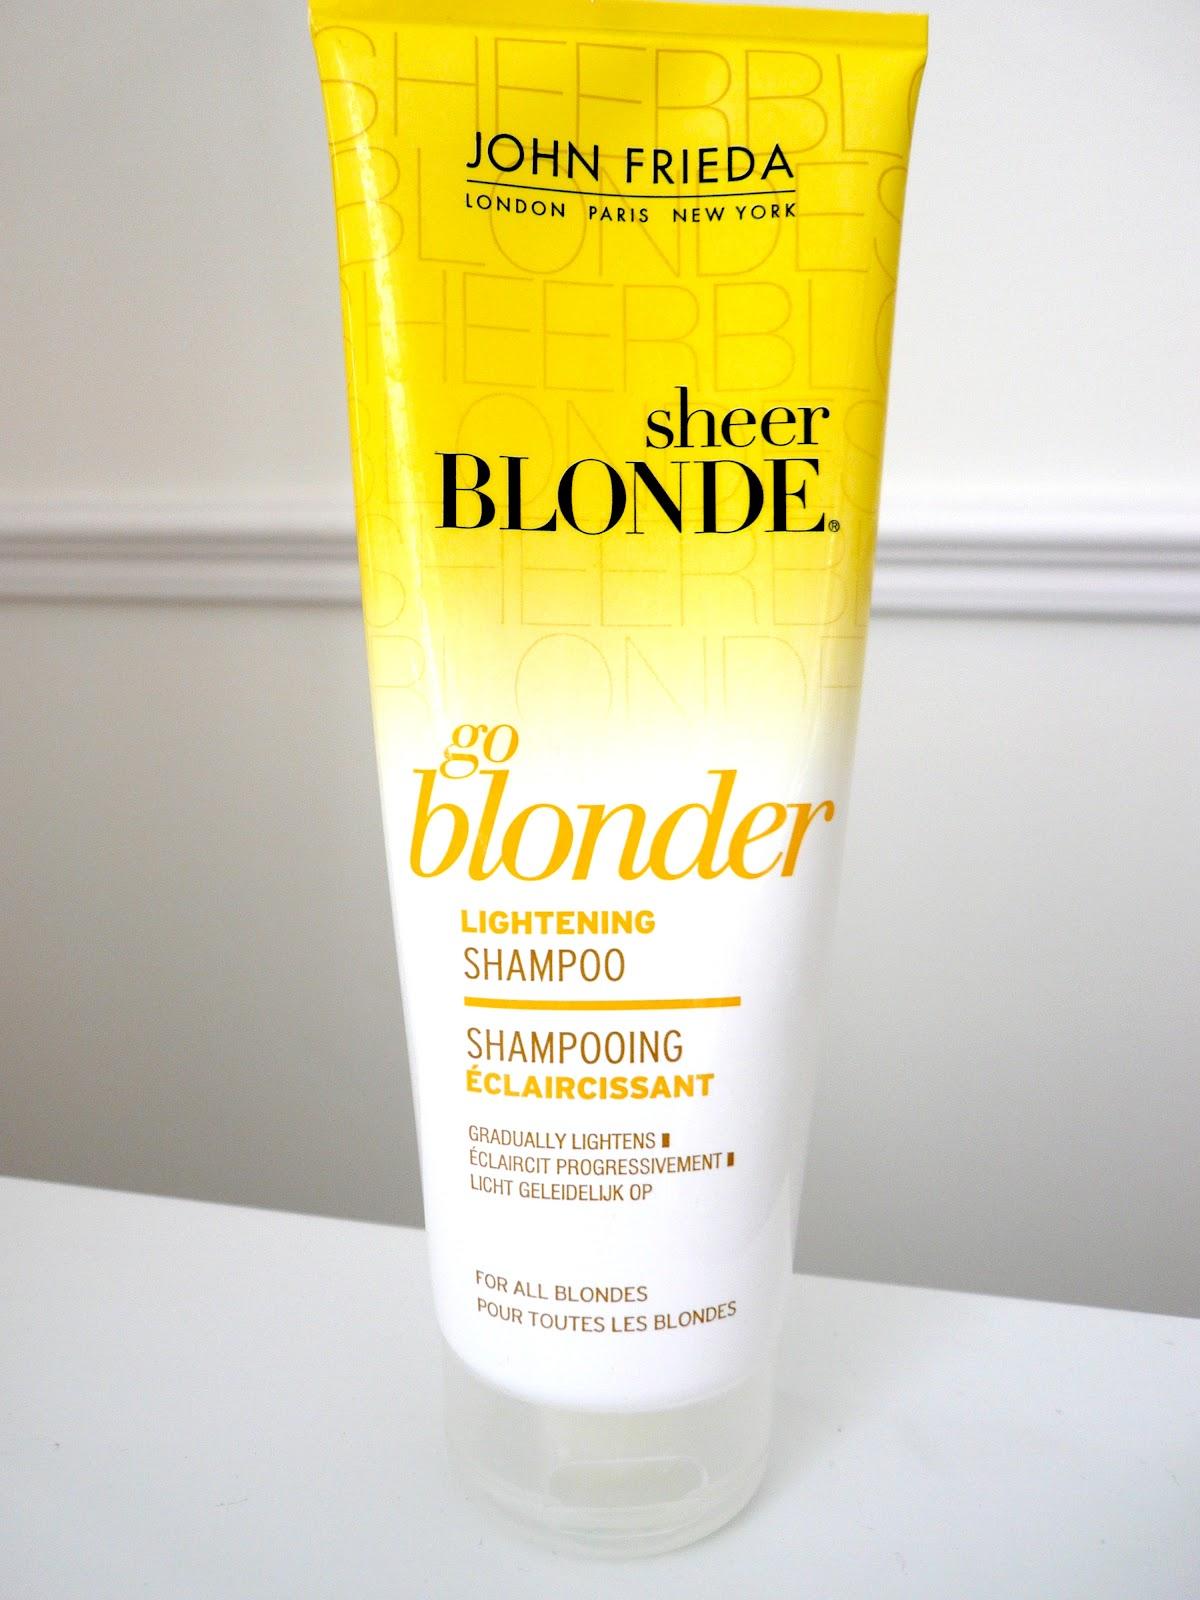 anna6belle review john frieda go blonder lightening shampoo. Black Bedroom Furniture Sets. Home Design Ideas